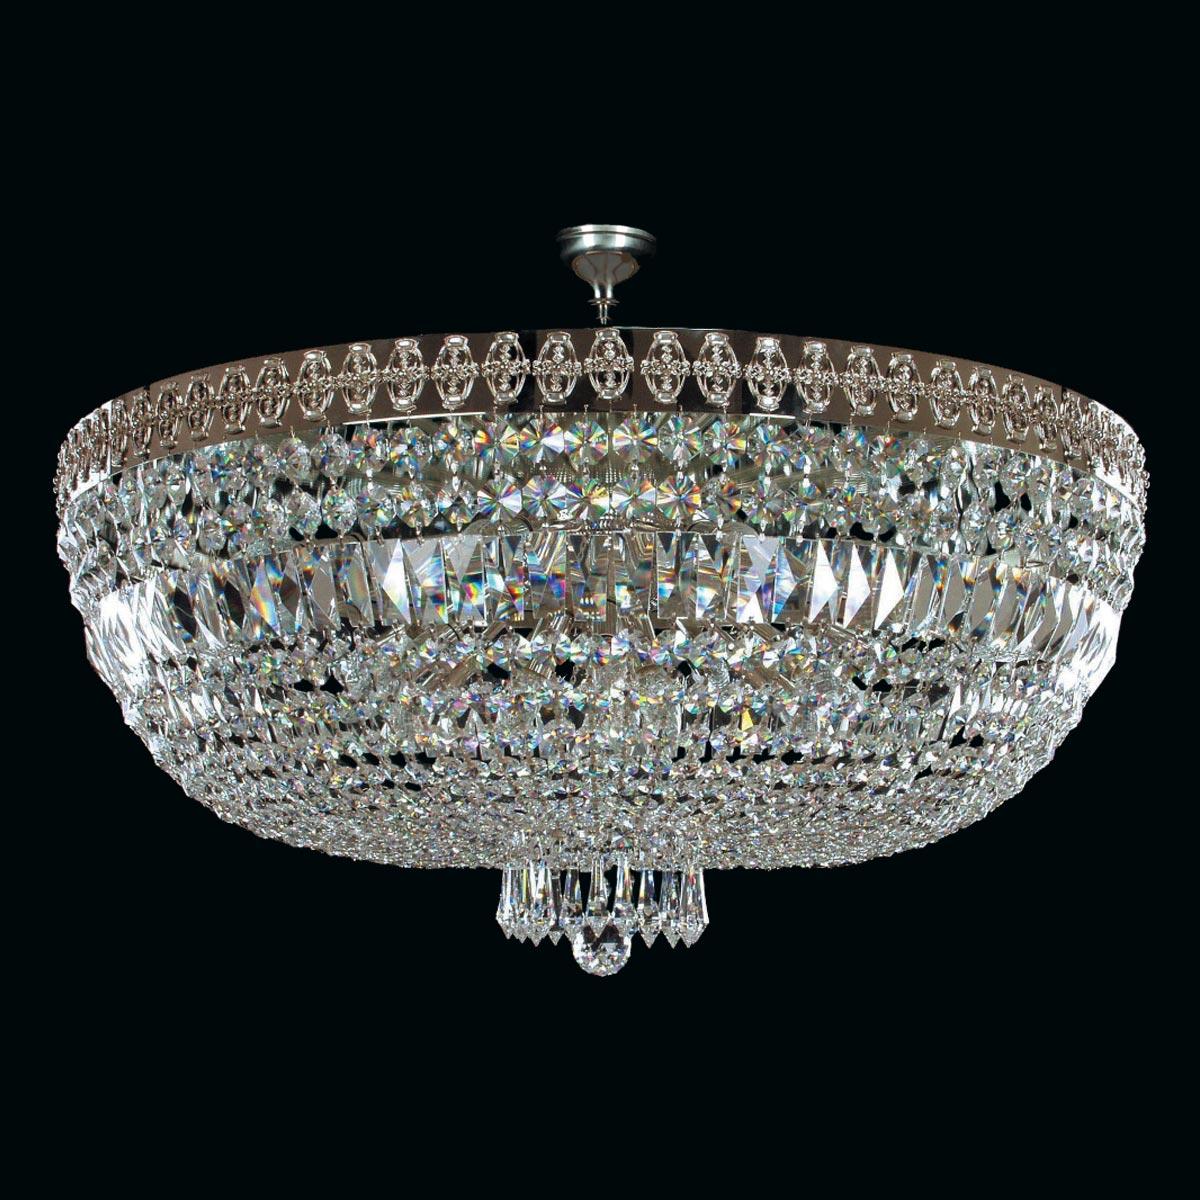 klassische kristall h ngeleuchte dion xxi lunapoint. Black Bedroom Furniture Sets. Home Design Ideas